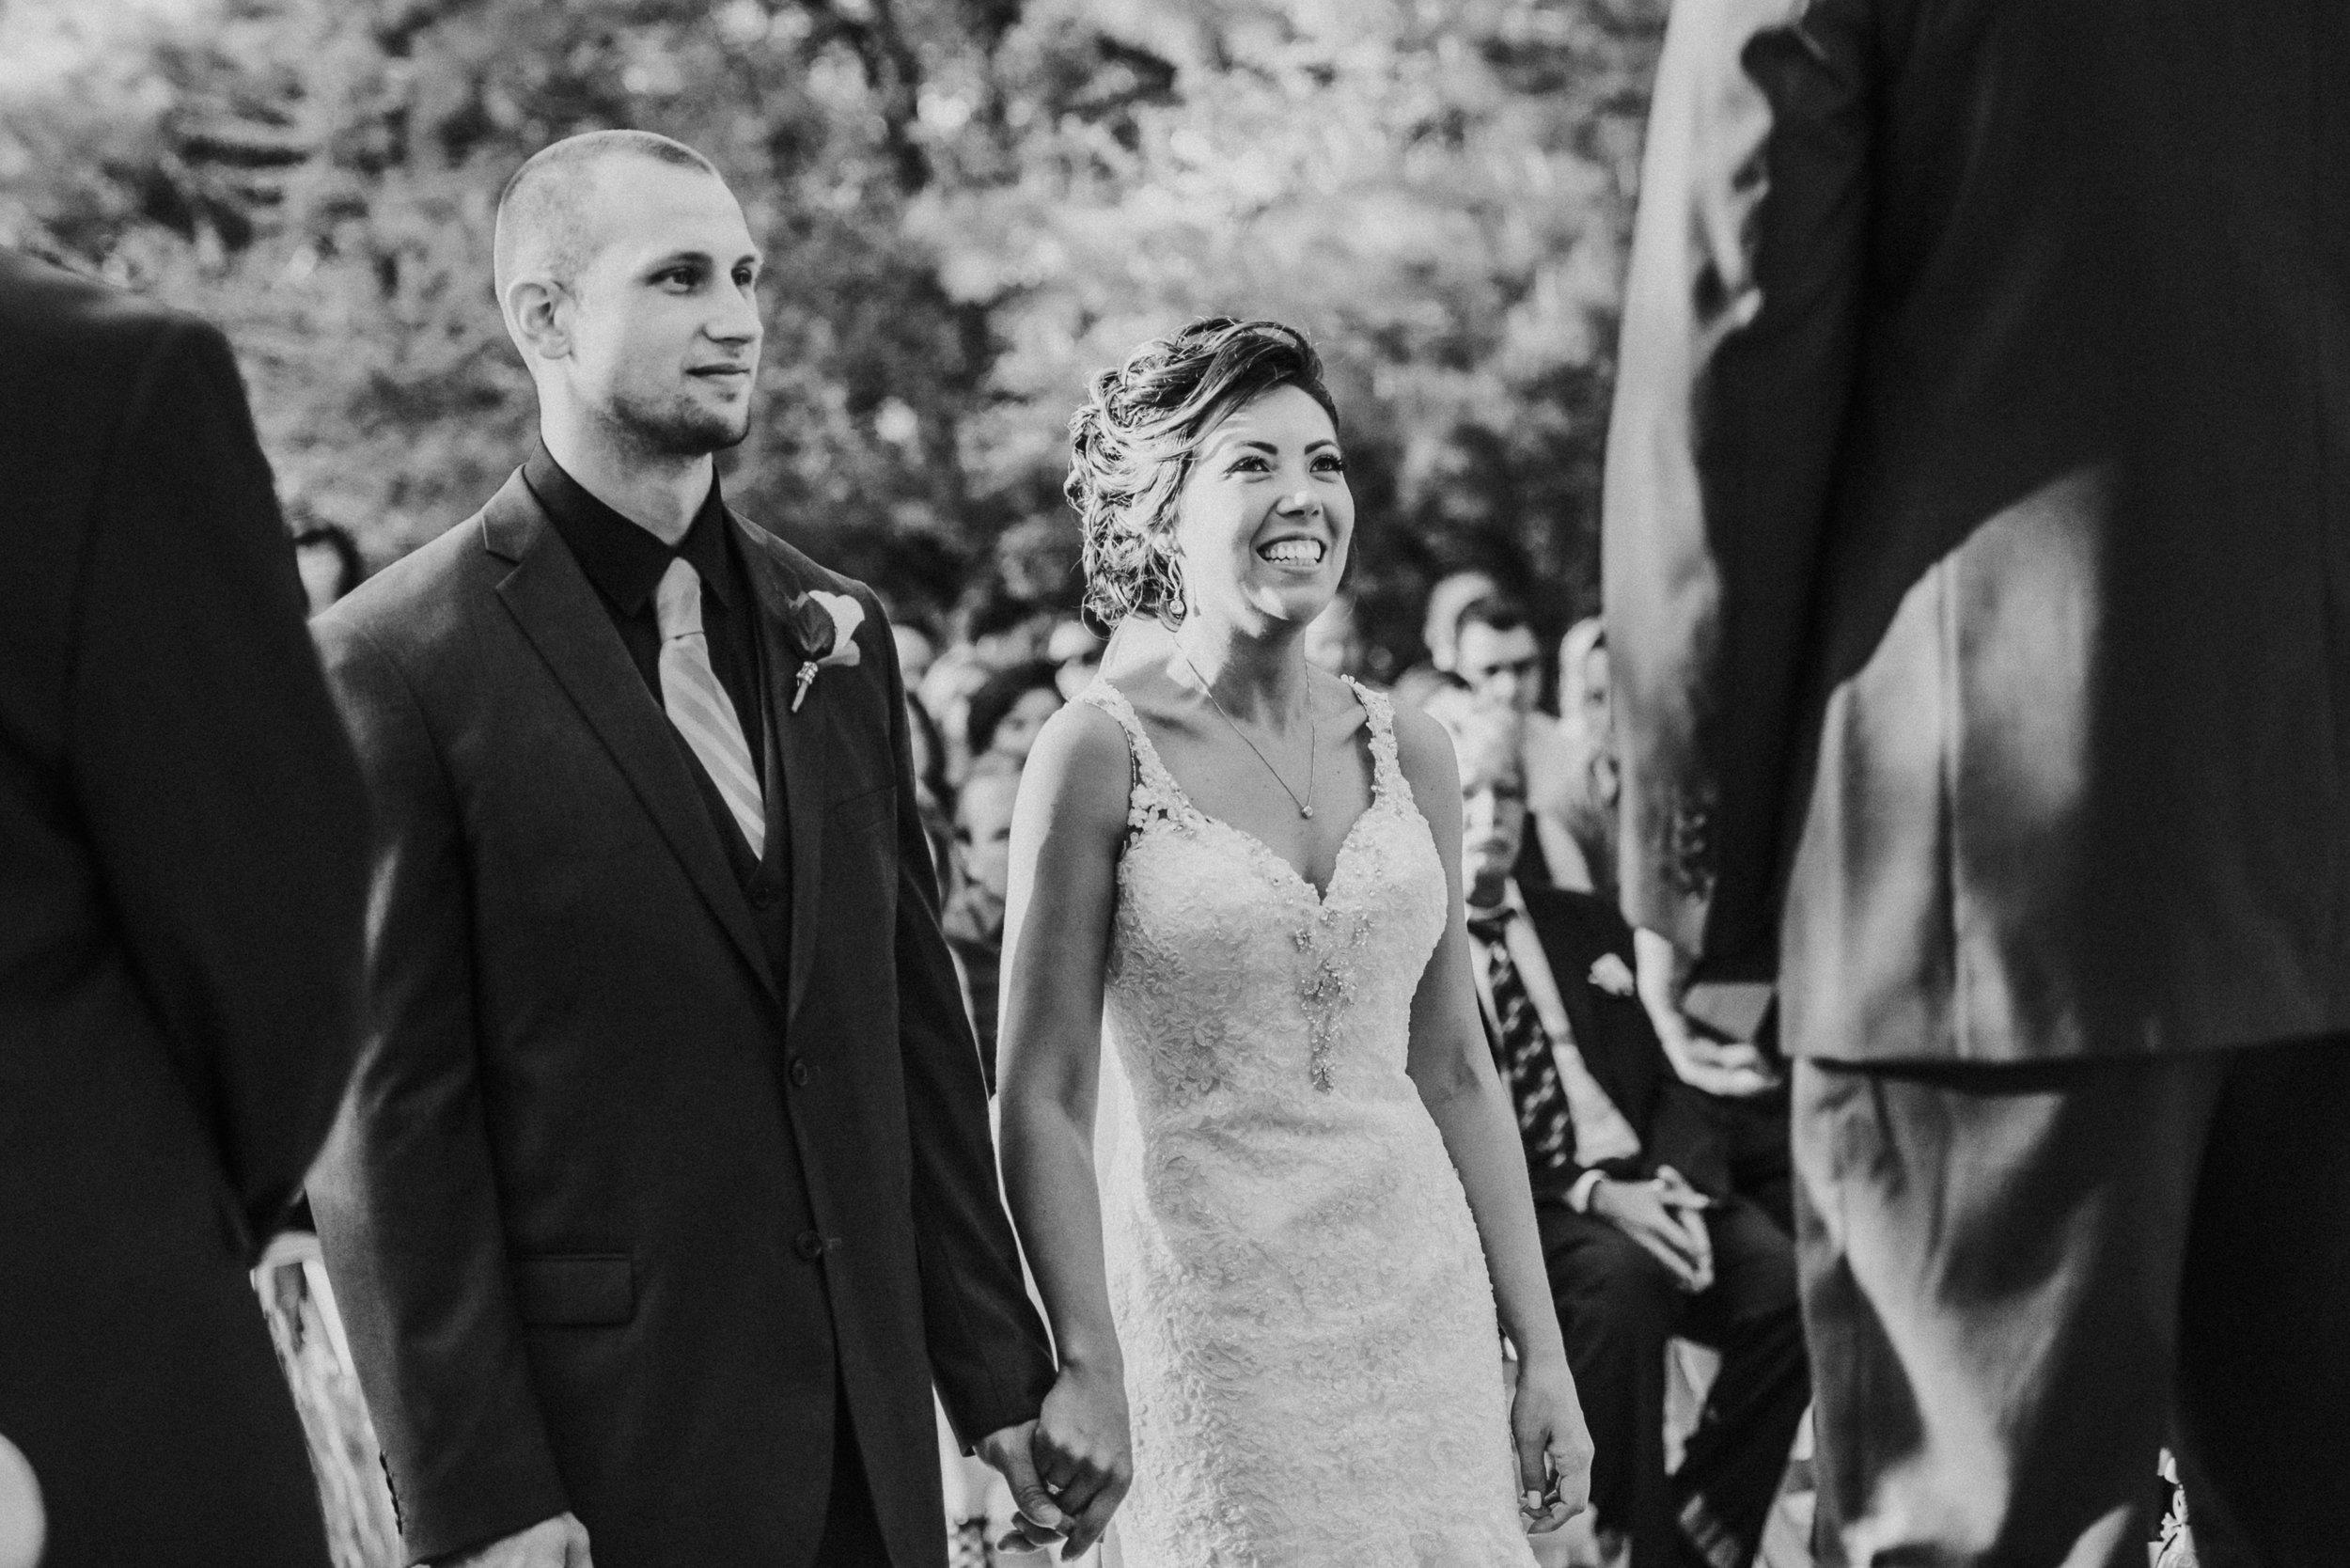 Christina-and-Gene-Wedding-Marla-Rain-Photography-331.jpg